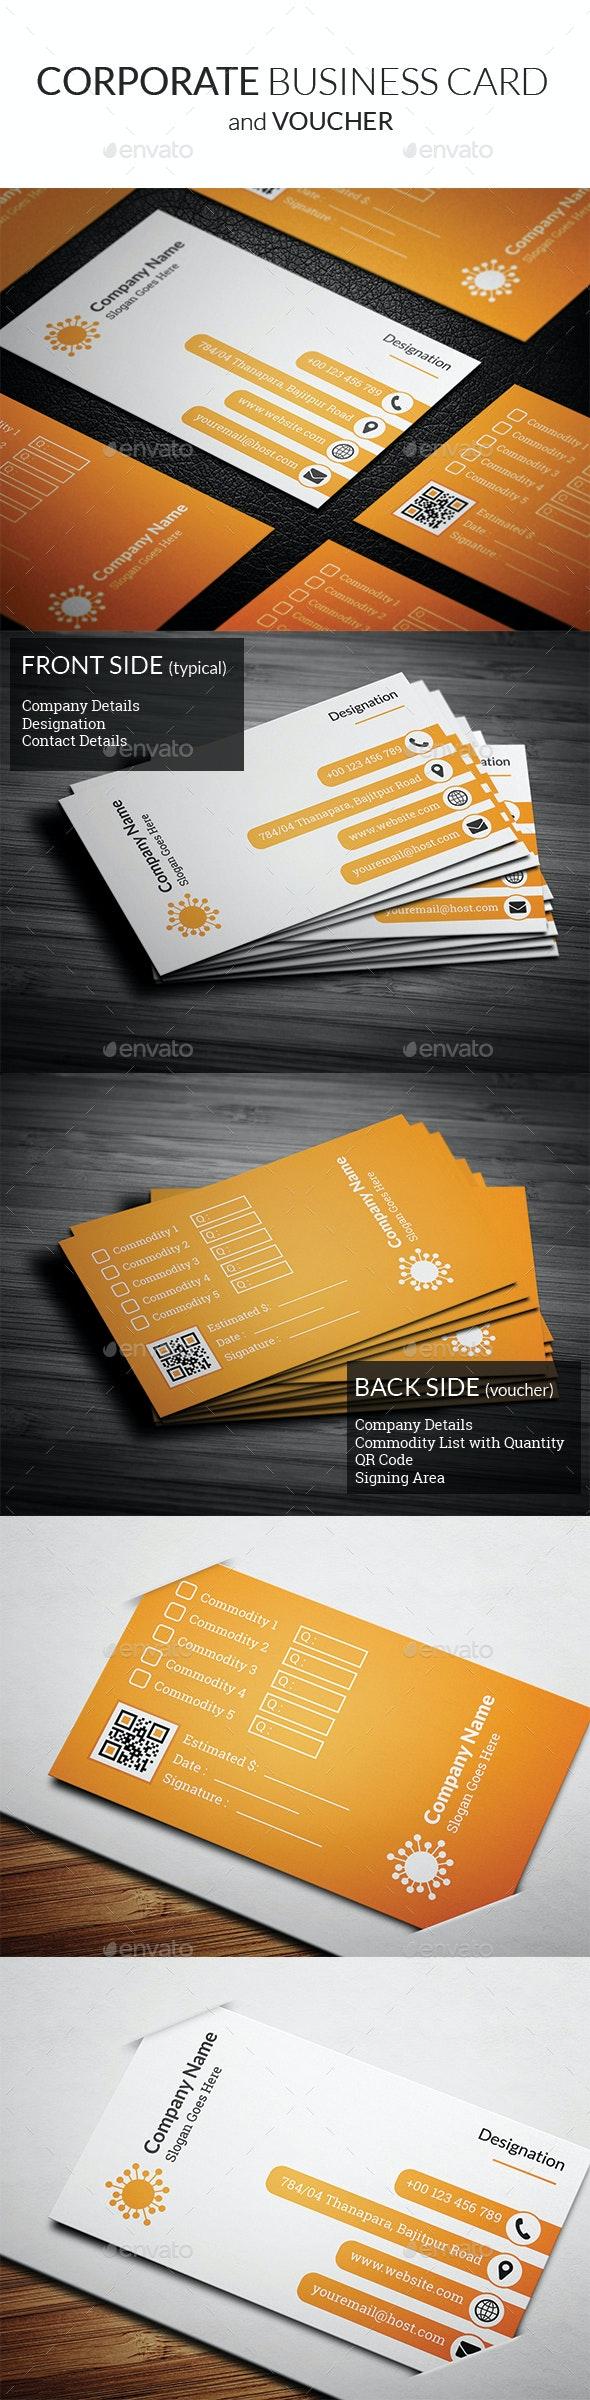 Corporate Business Card vol2 - Corporate Business Cards